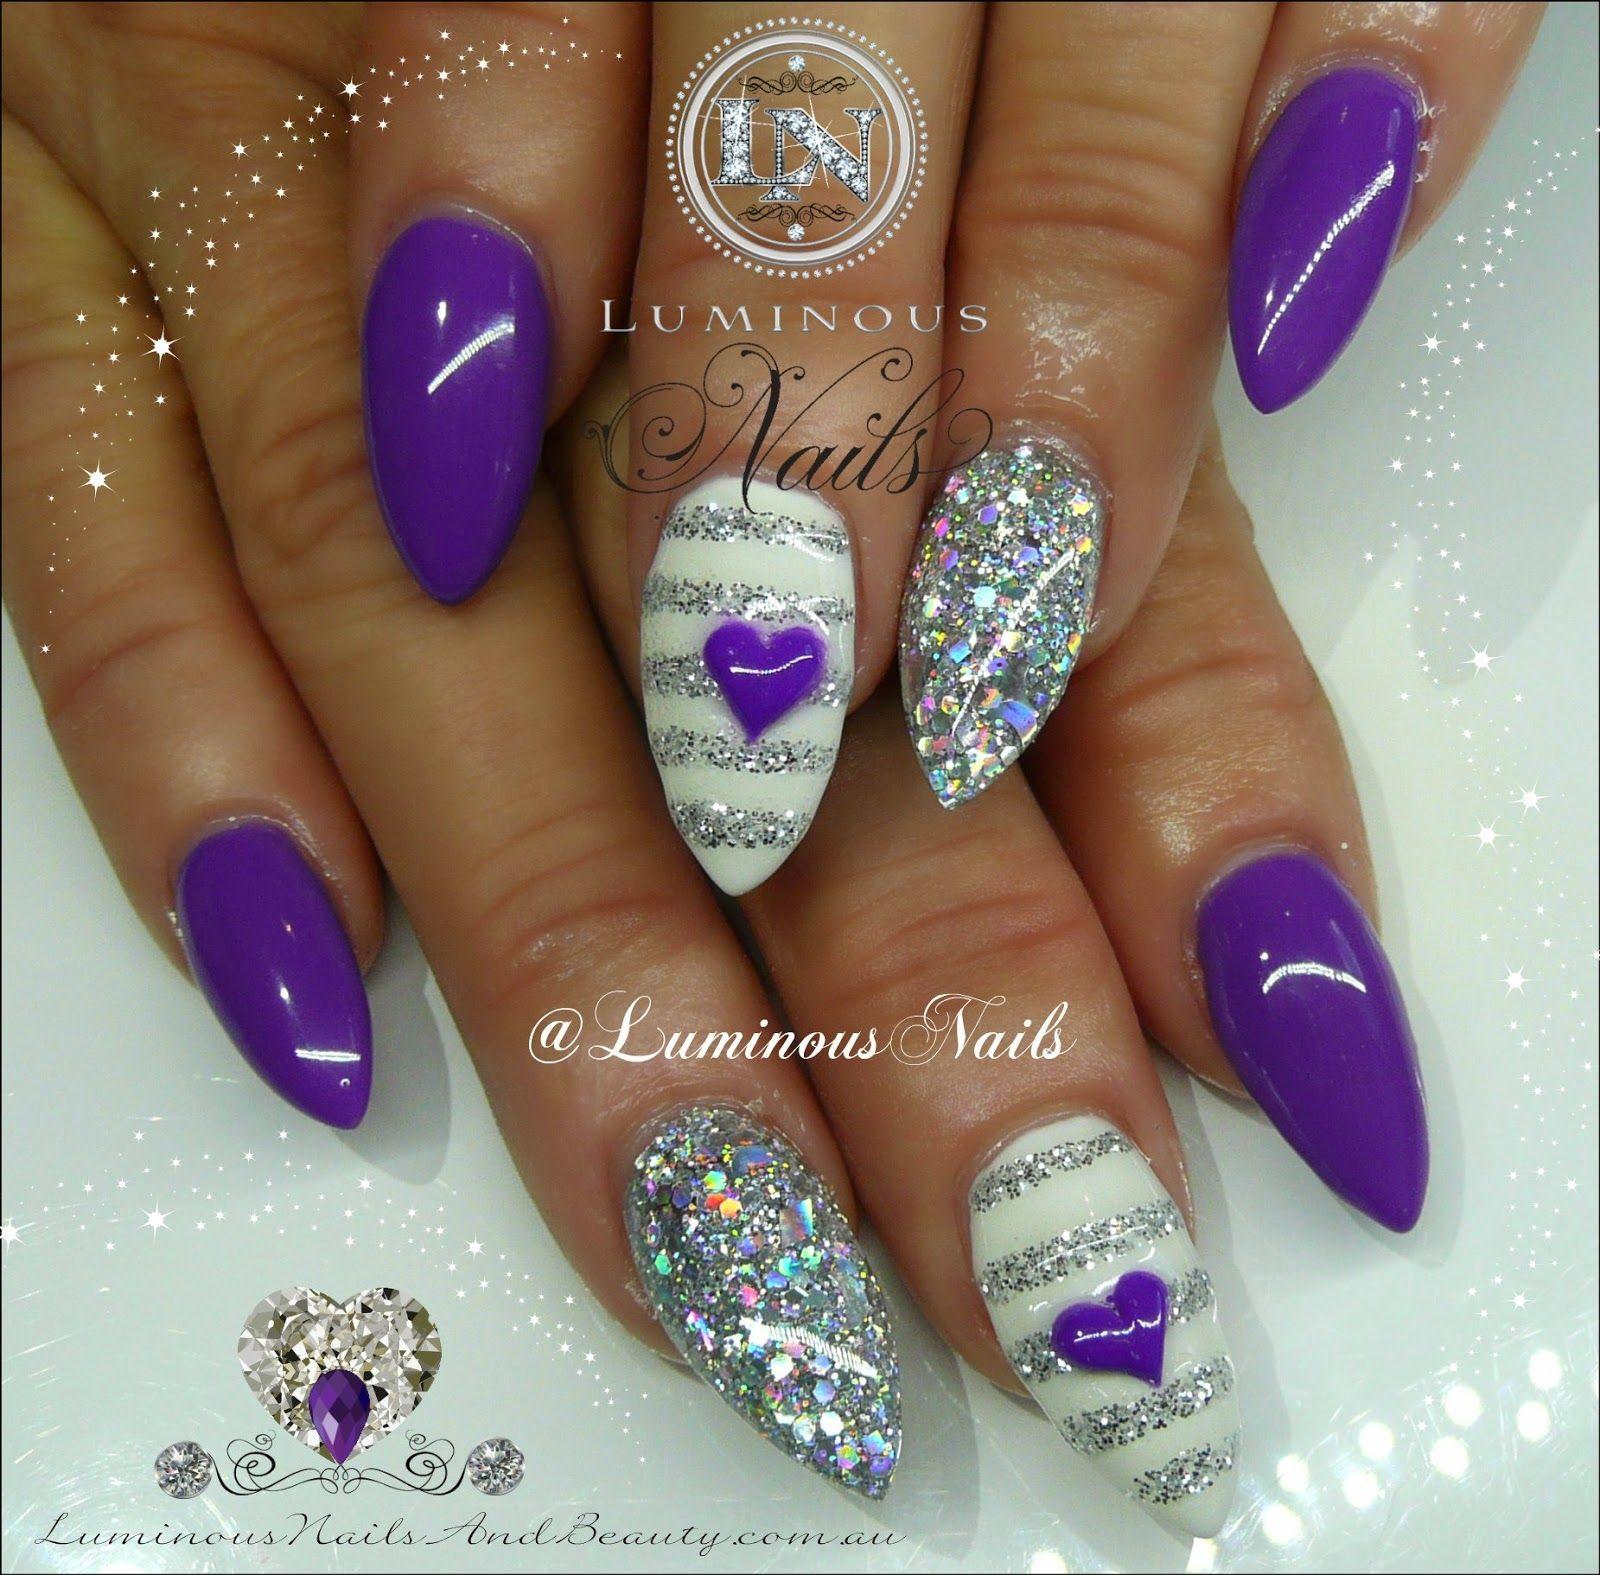 luminous nails: purple, silver & white nails | nails